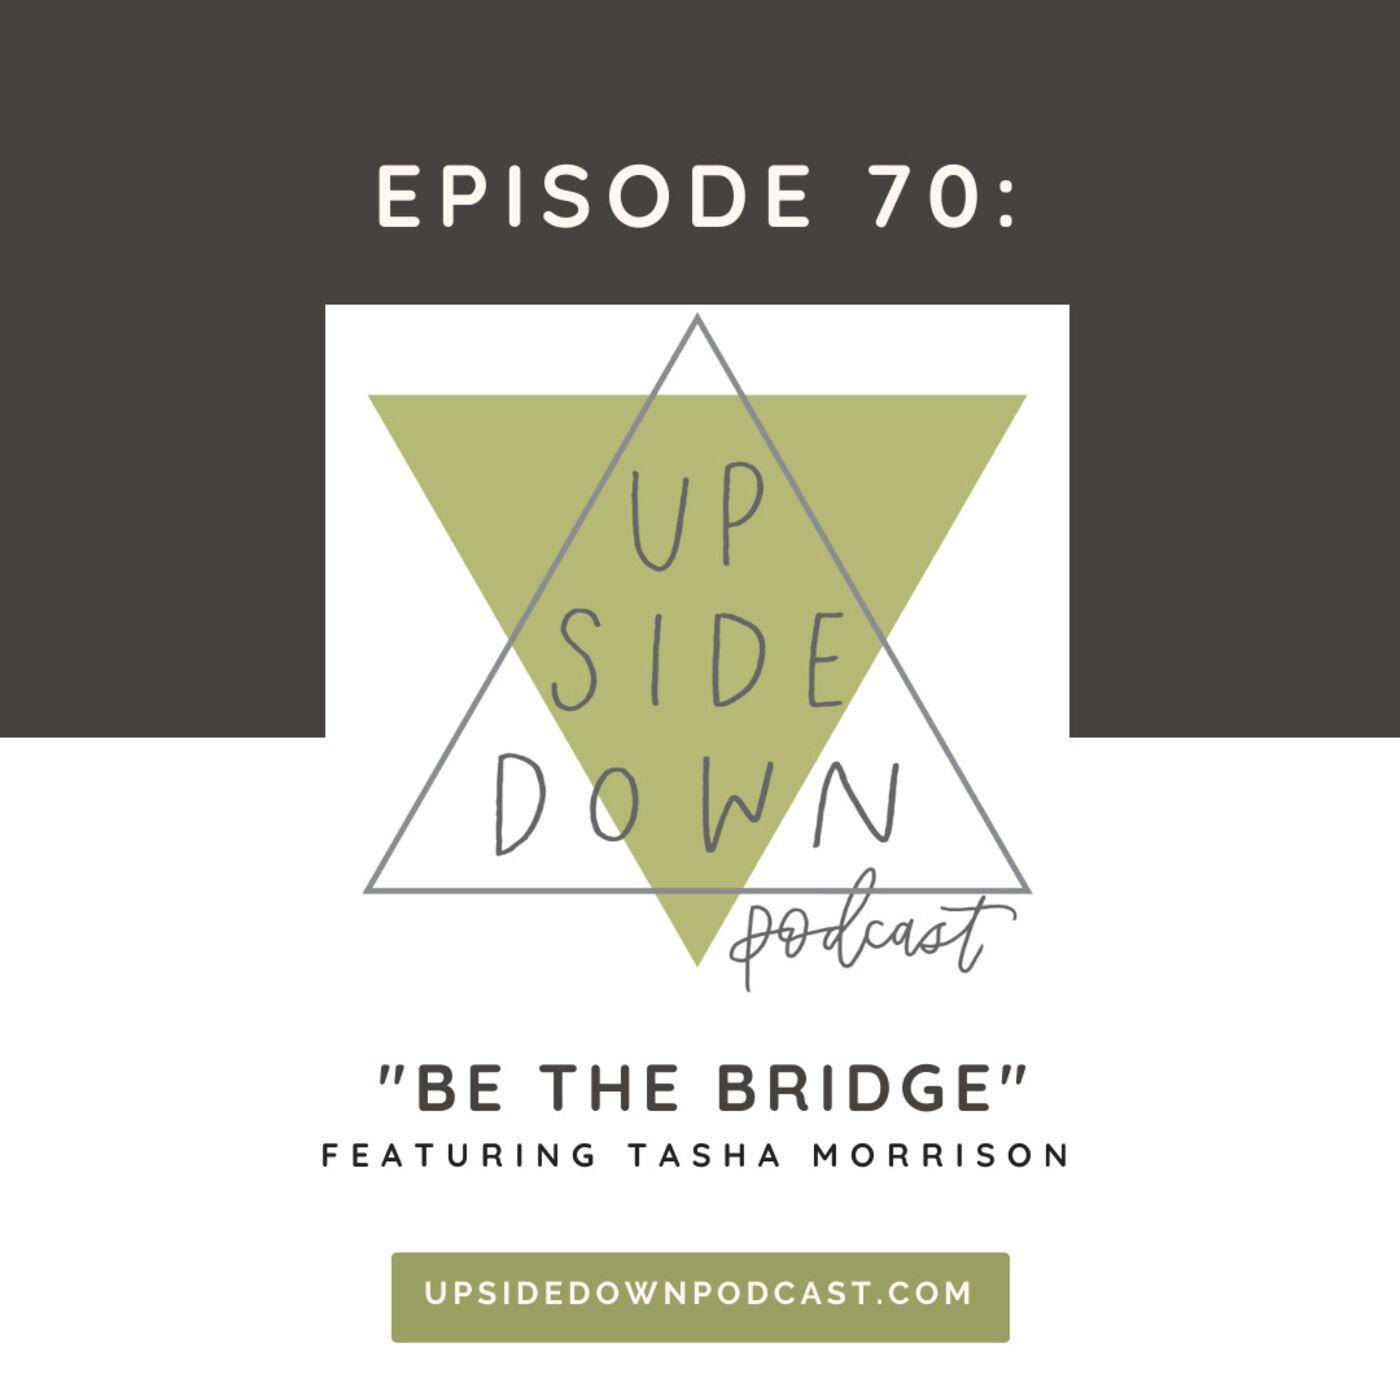 Episode 70: Be the Bridge with Latasha Morrison